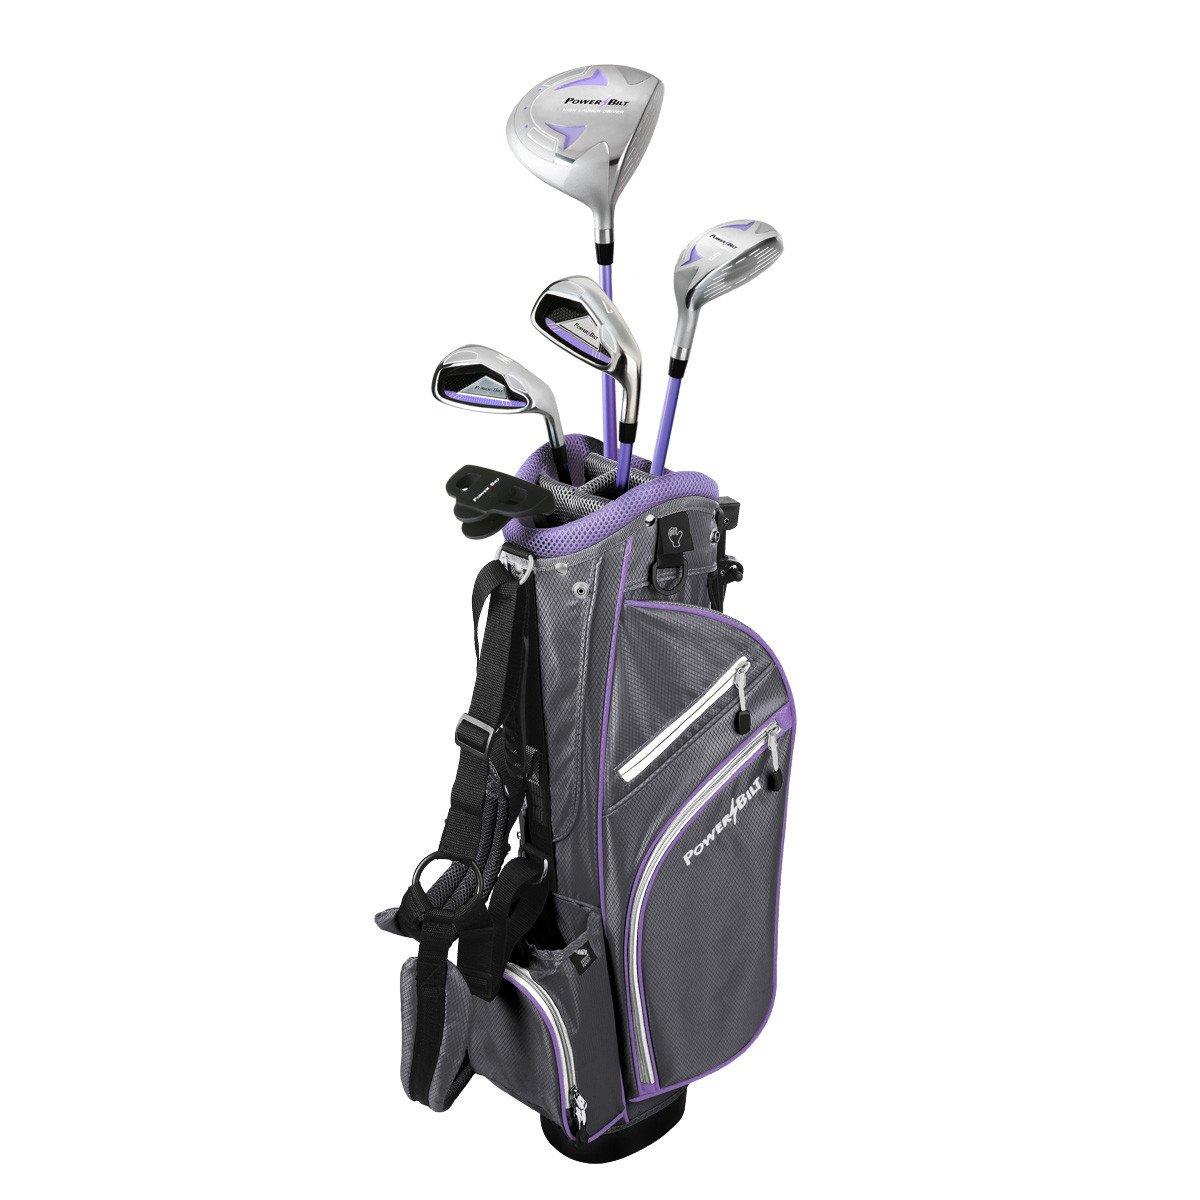 Powerbilt Junior Kids Girl's Ages 9-12 Golf Club Set, Right Hand, Lavender